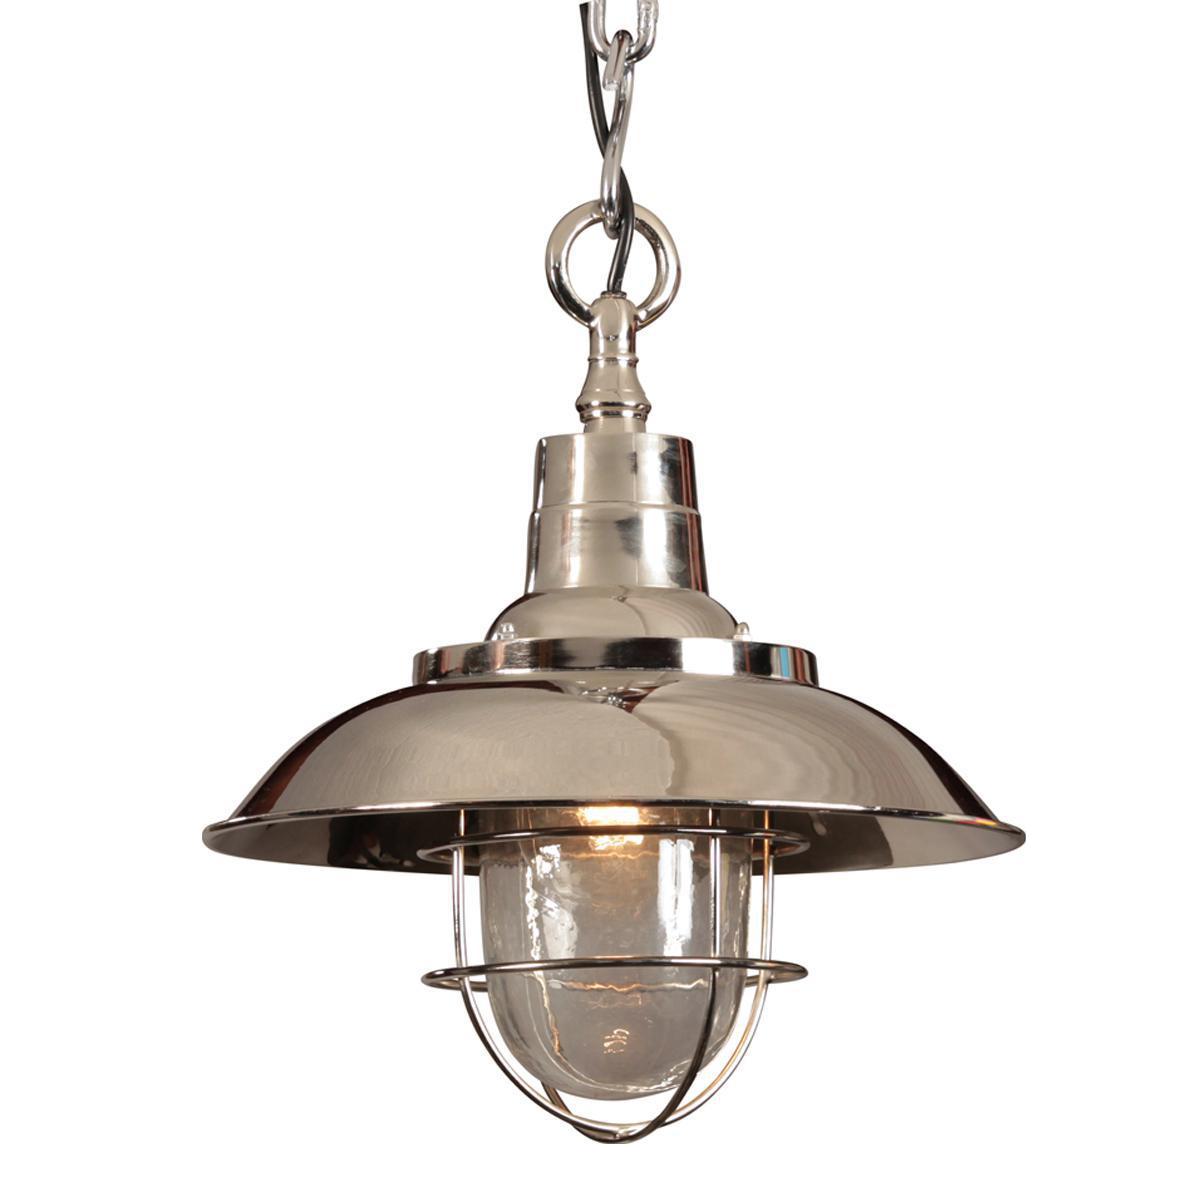 Industrial Light Hangers: Industrial Hanging Spot Light